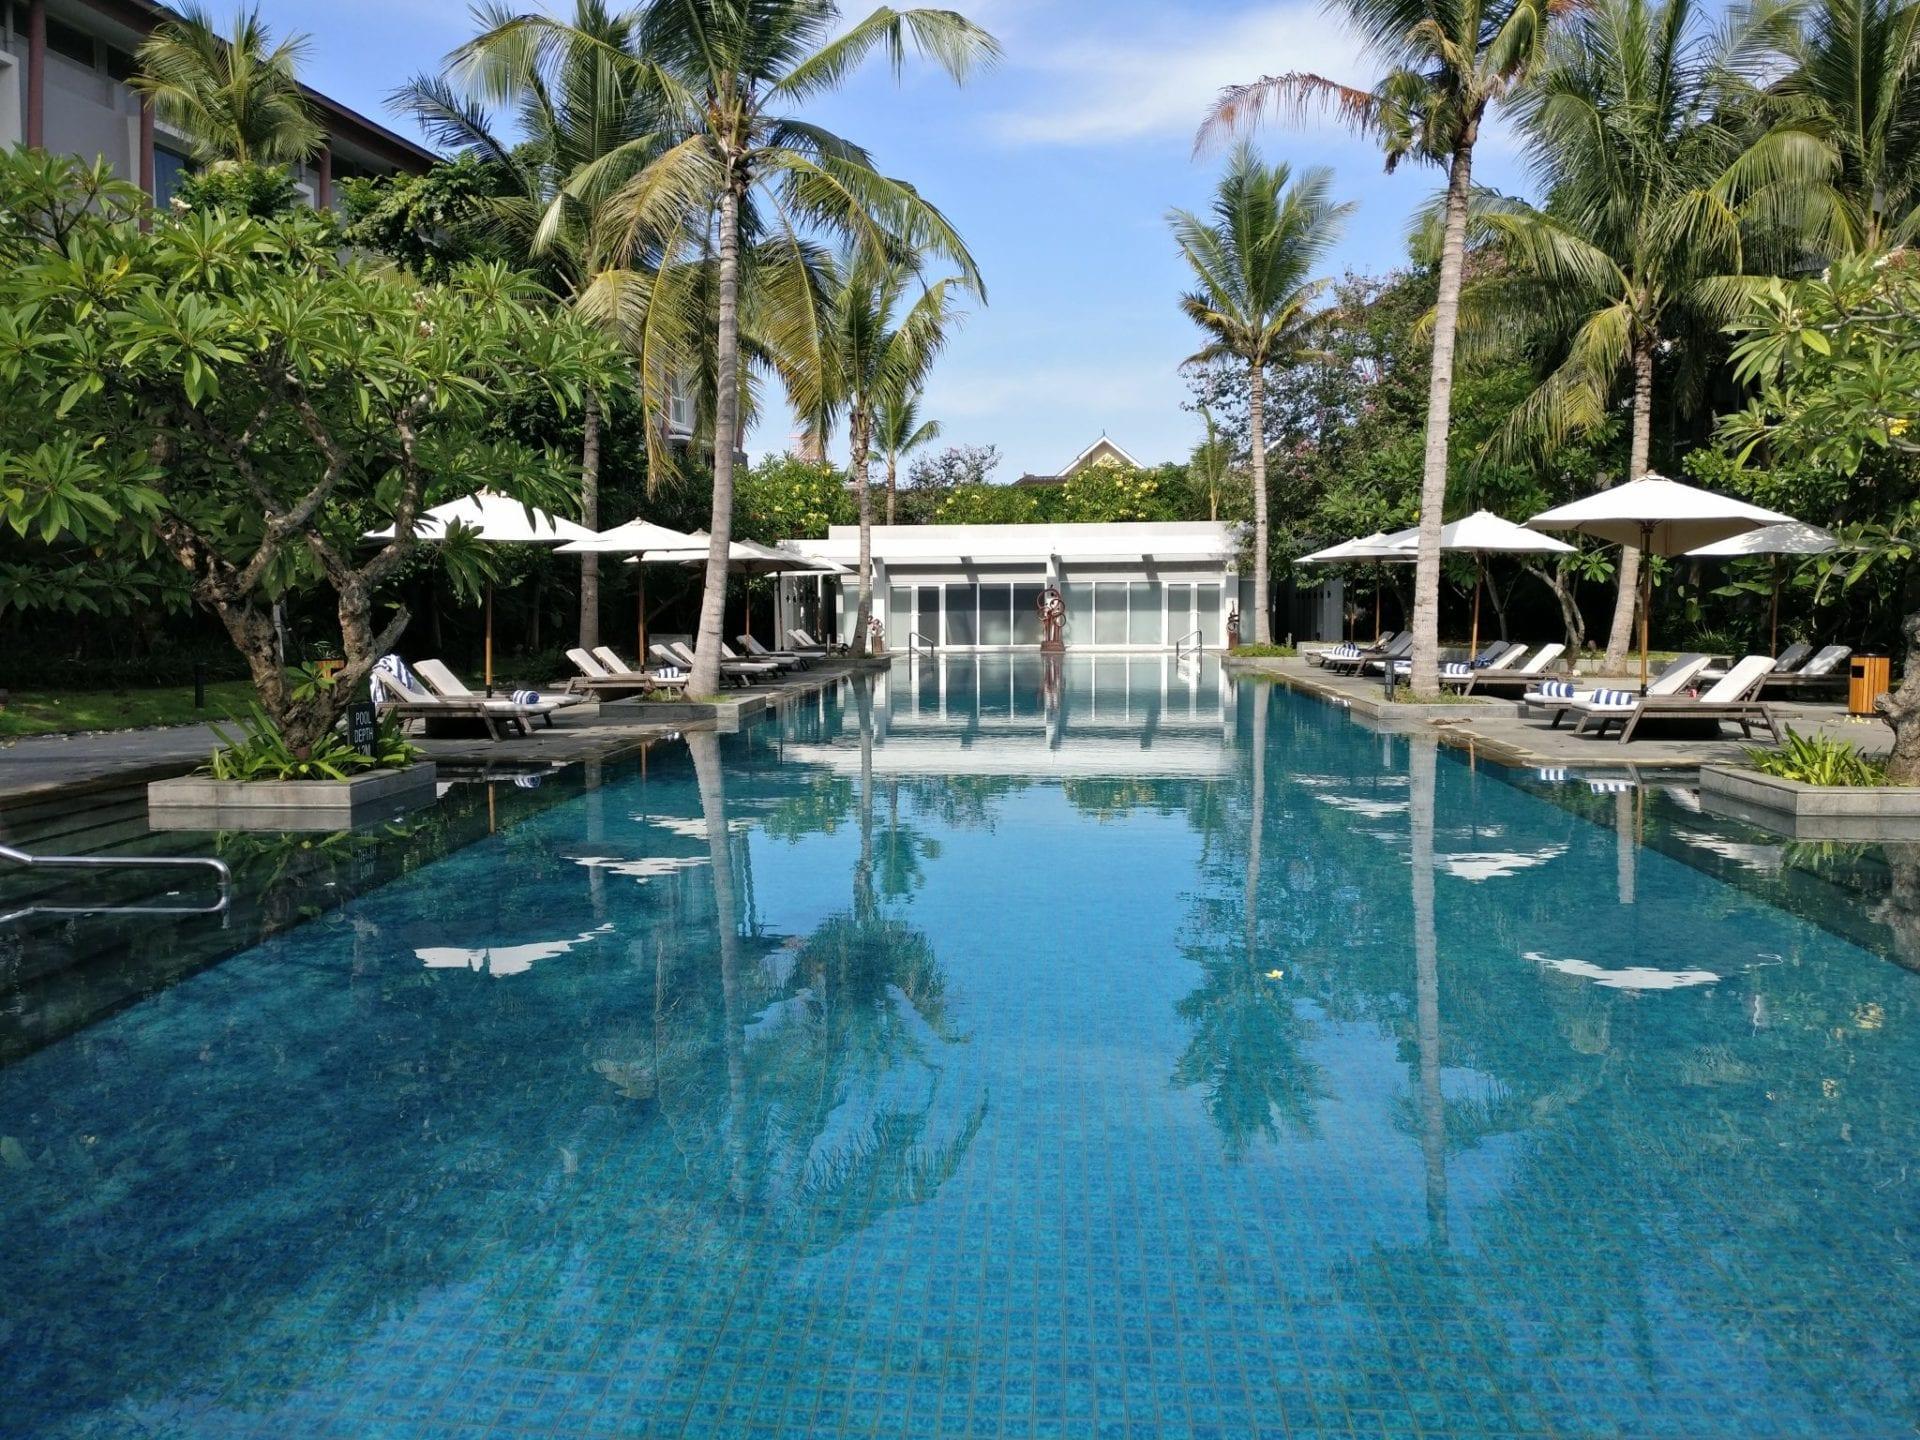 hilton-garden-inn-bali-pool